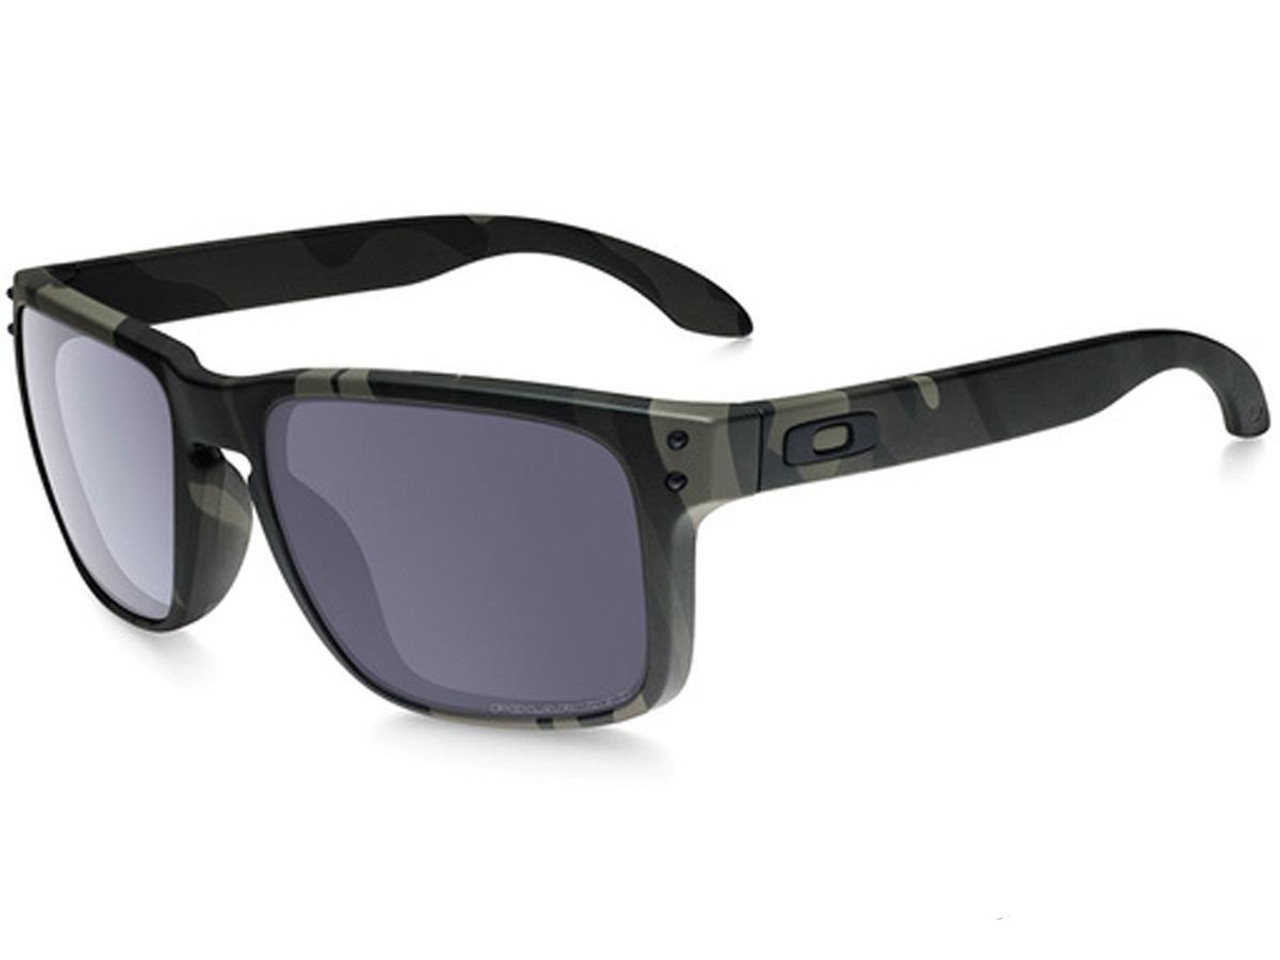 6ee01d333289d Oakley Holbrook Sunglasses (Color  Multicam Black   Grey Polarized) - Hero  Outdoors